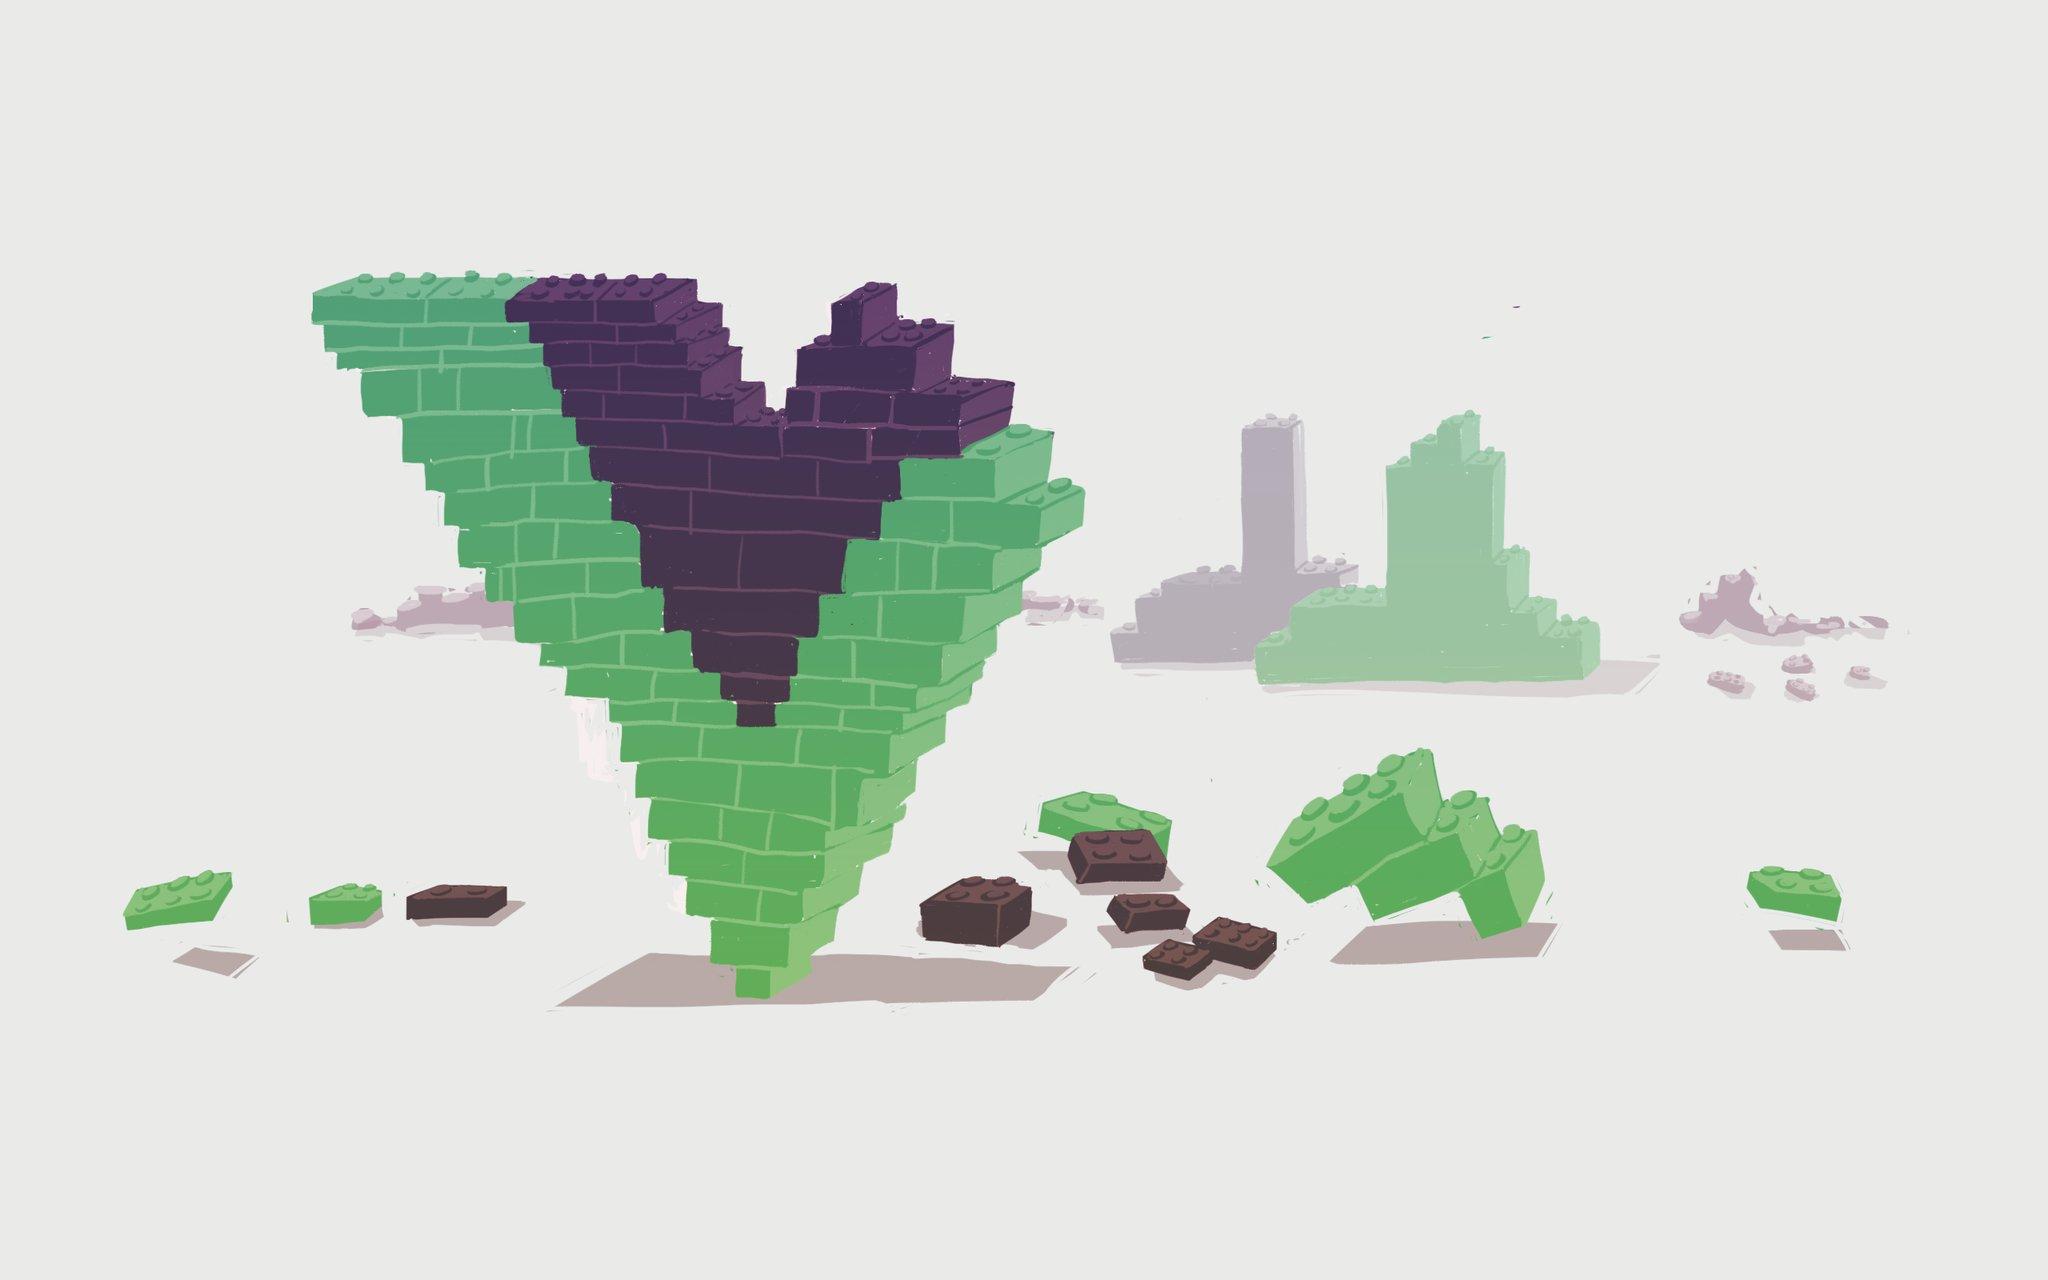 Vue 2.0 Released: The Declarative UI Framework